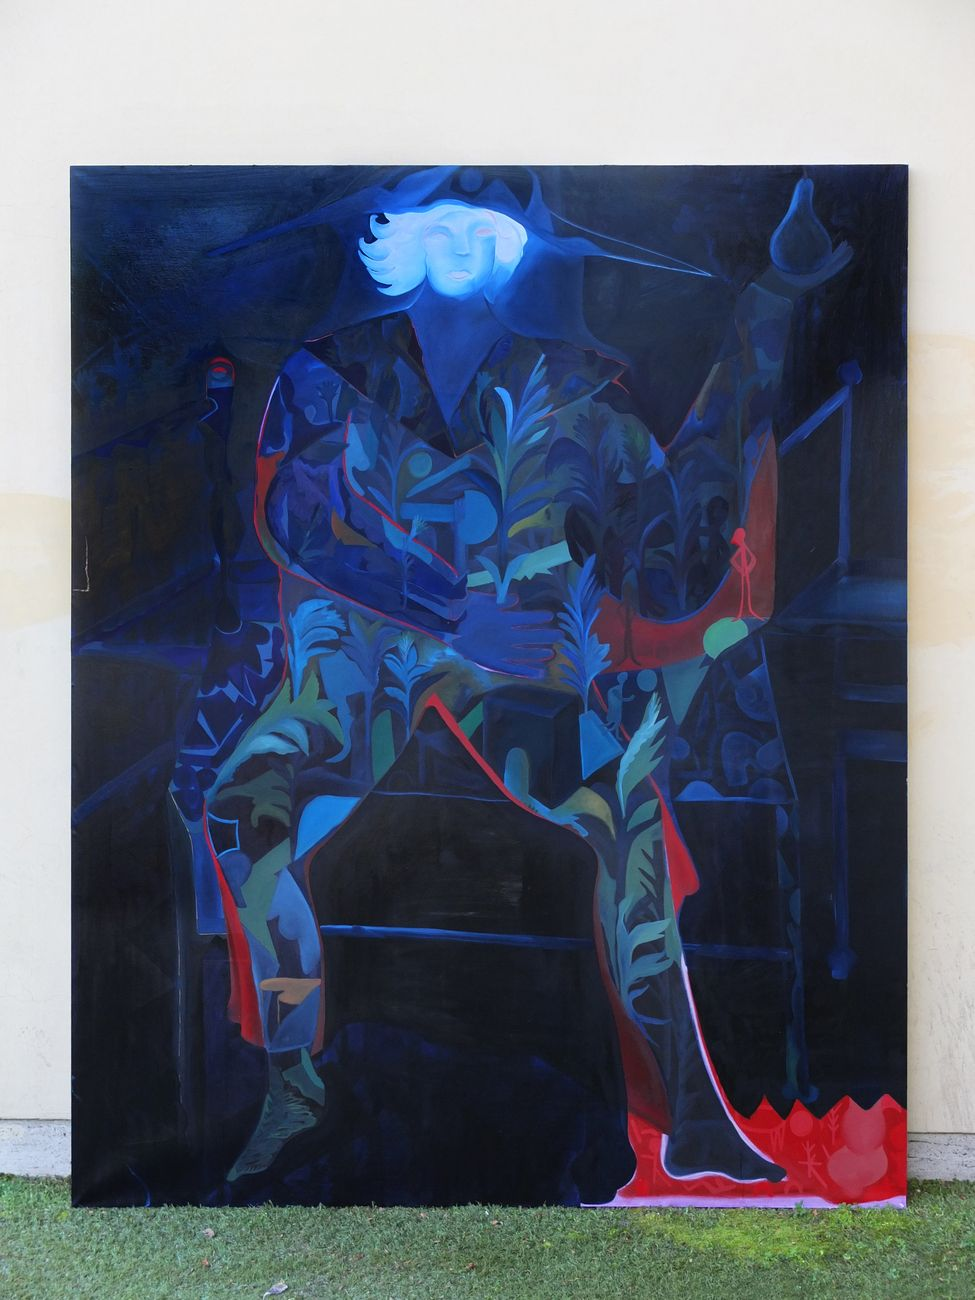 Alice Visentin, Ginevra-Caraibi, oil on canvas, 200 x 250 cm